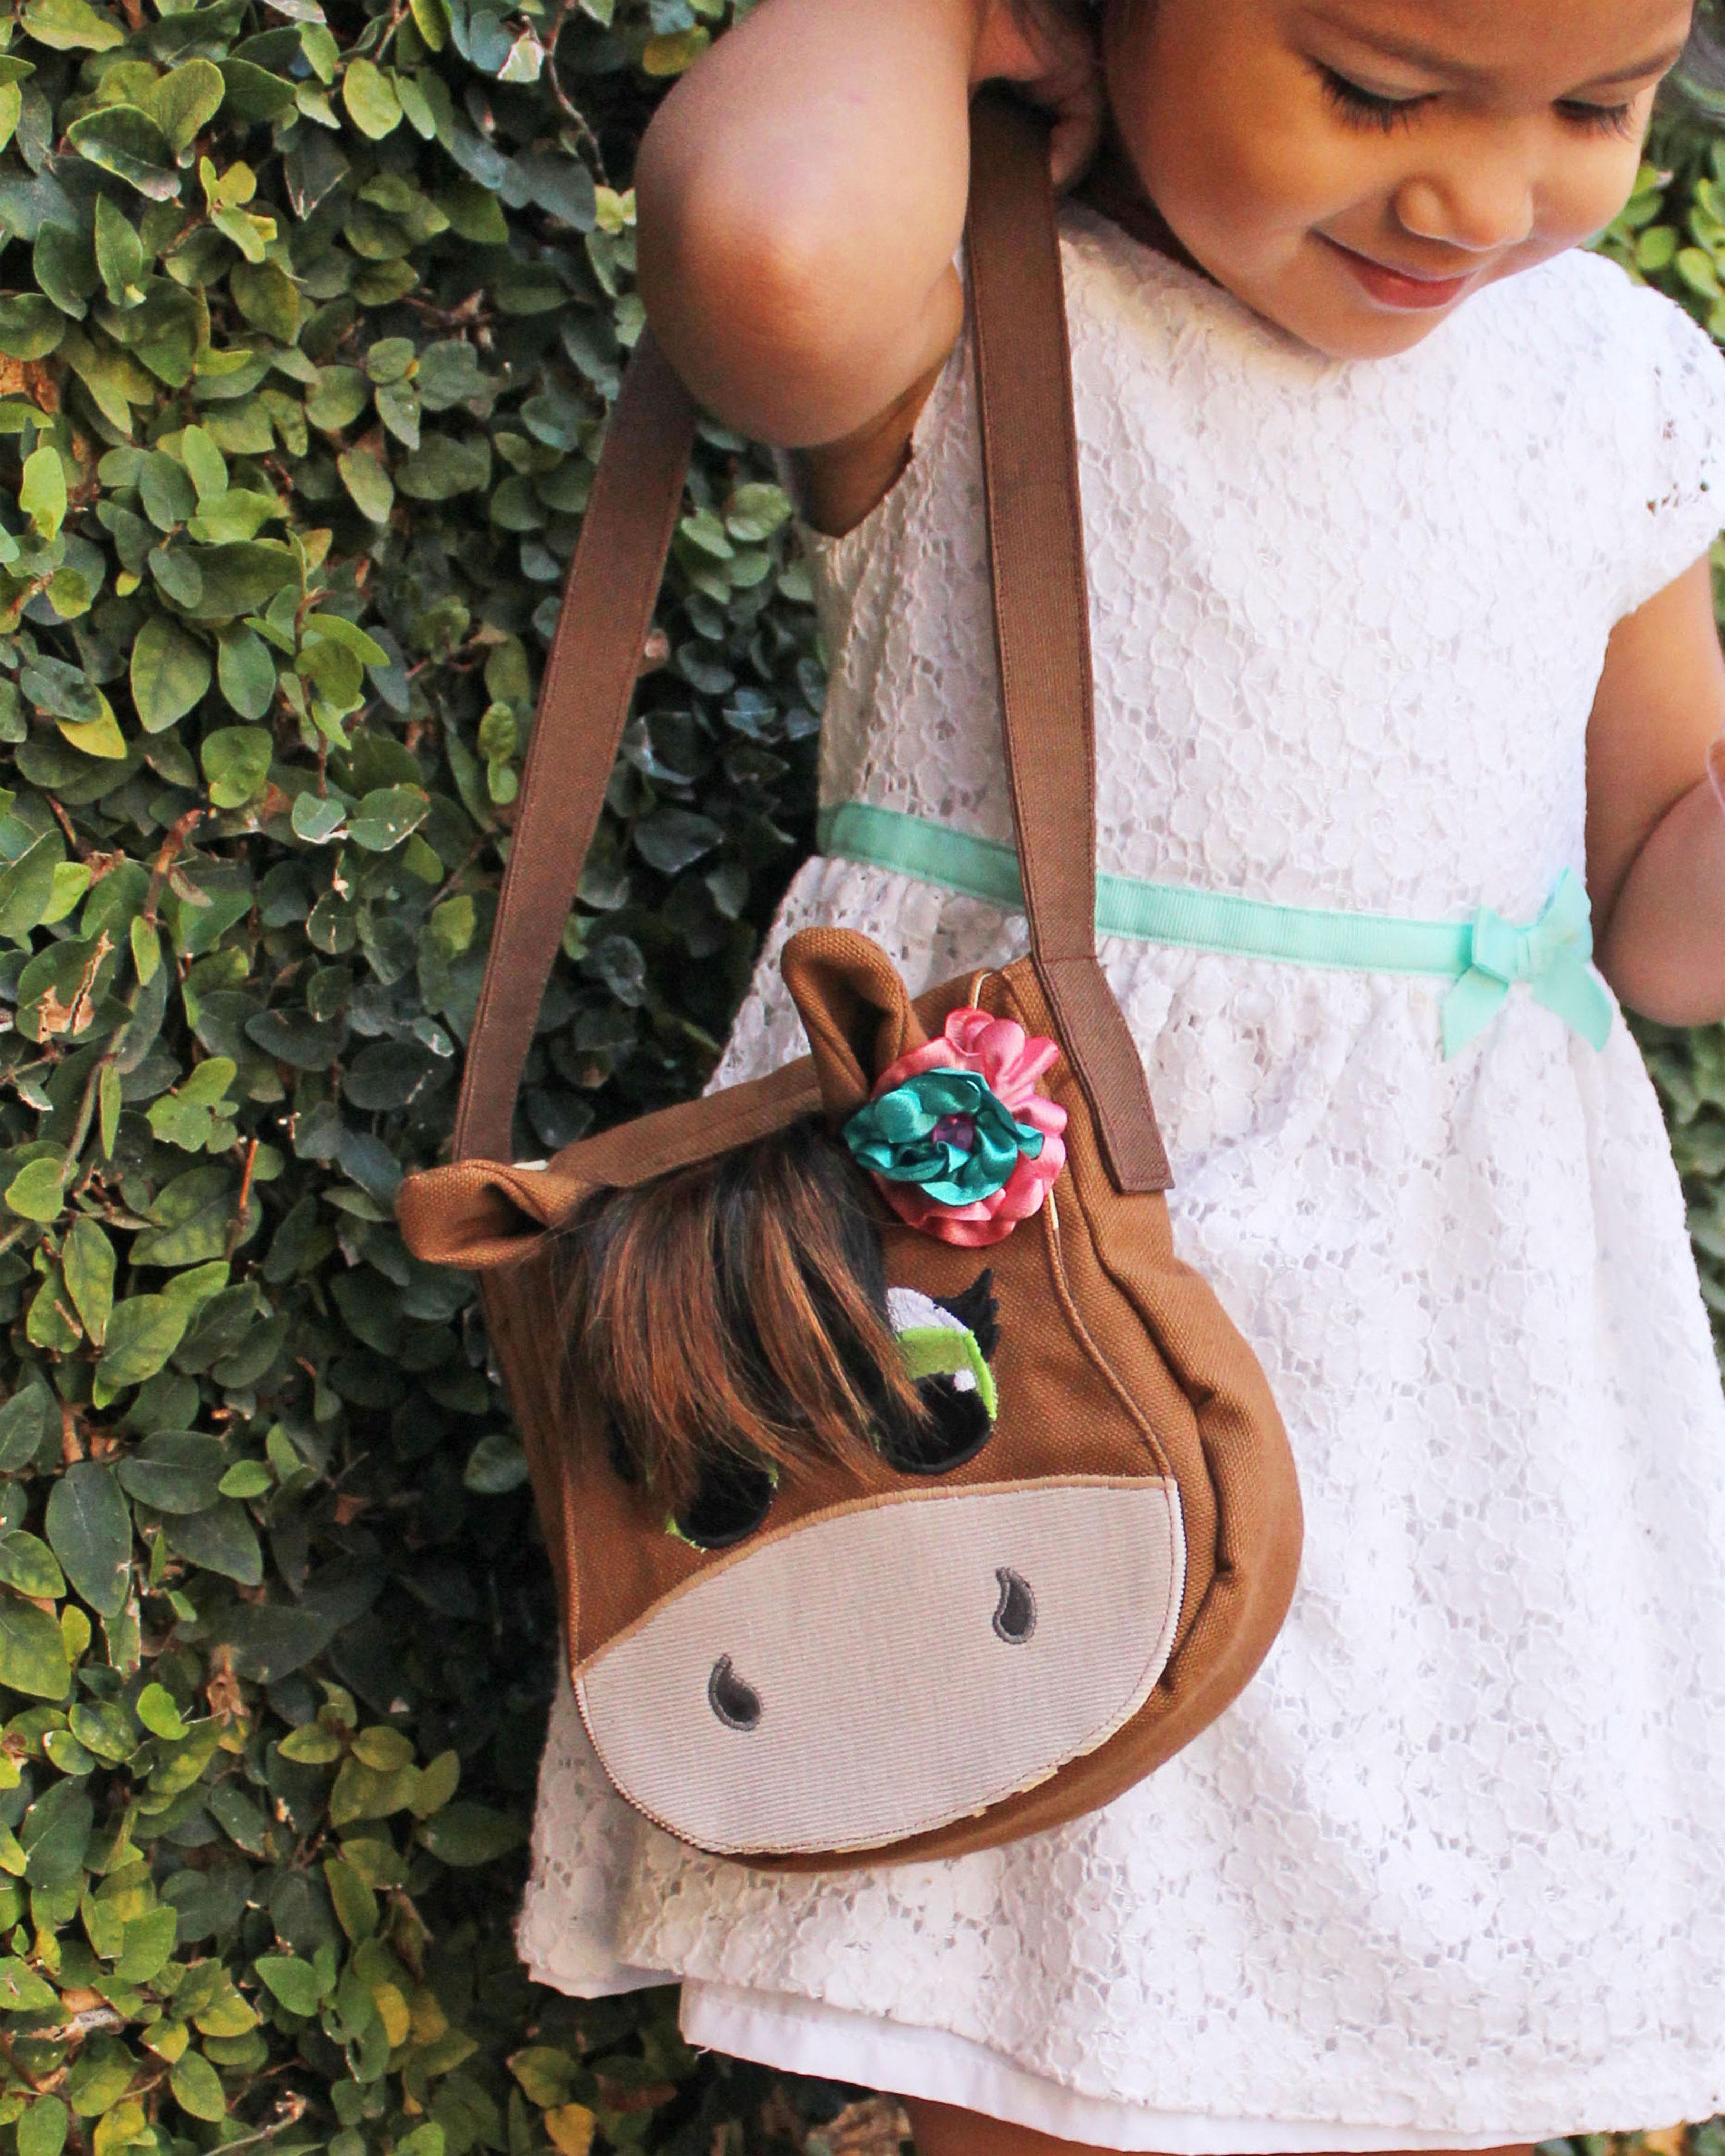 Horse Purse or Satchel Bag Child's Bag